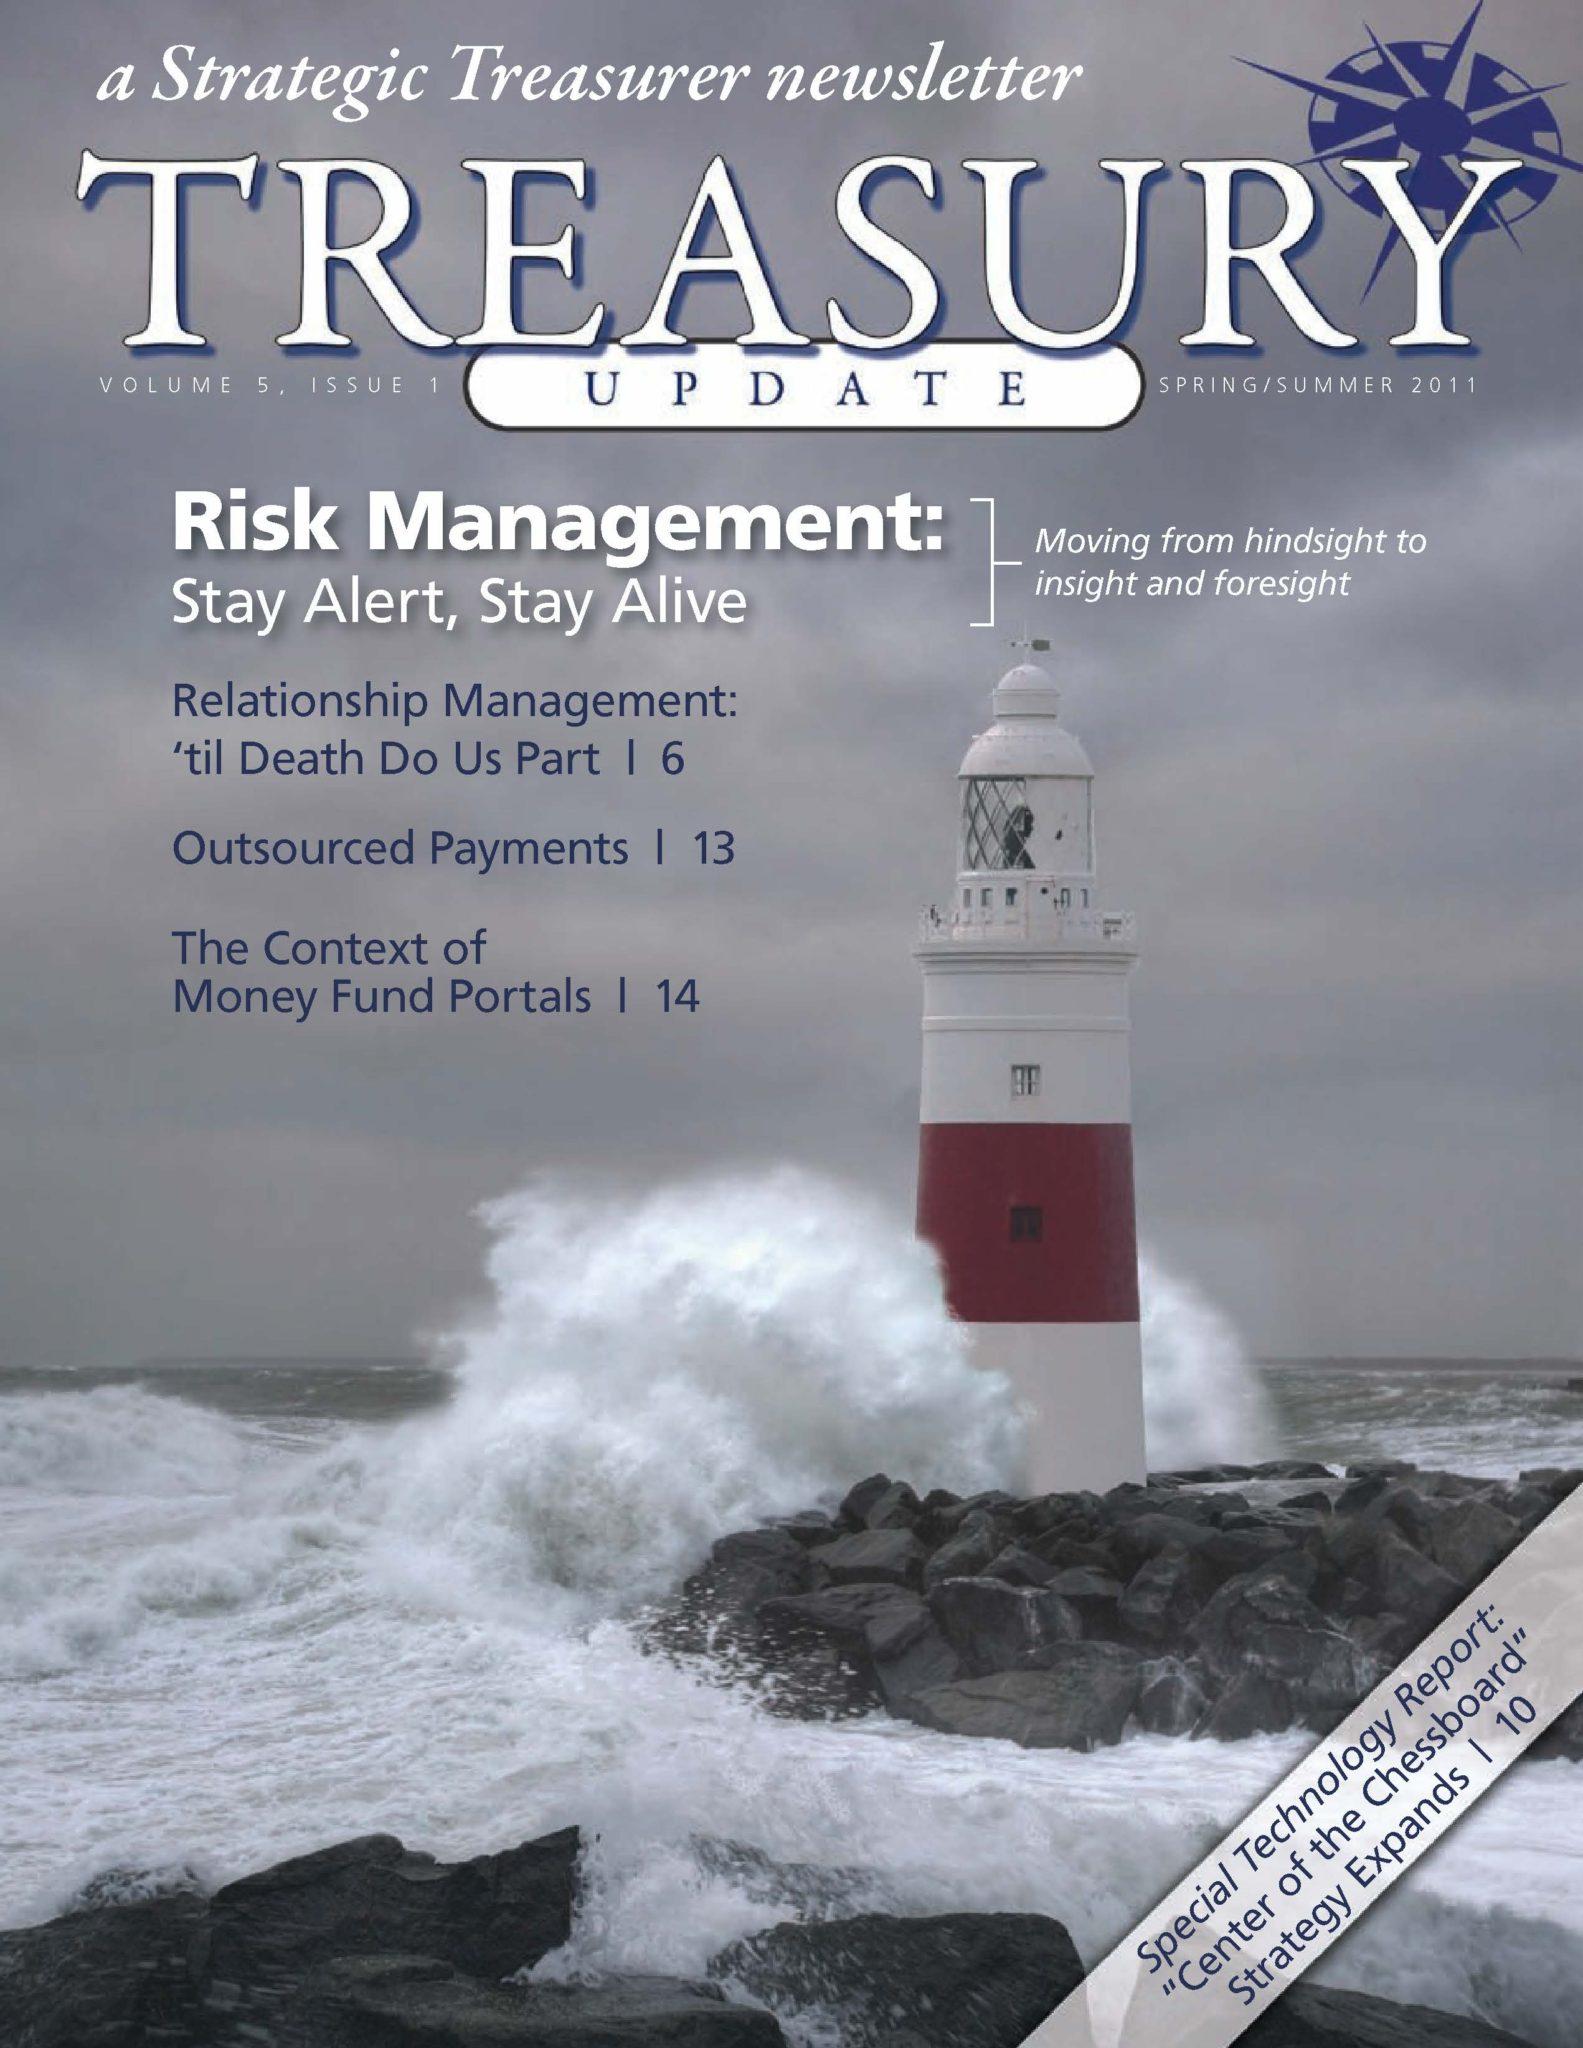 Spring/Summer 2011 Treasury Update Newsletter